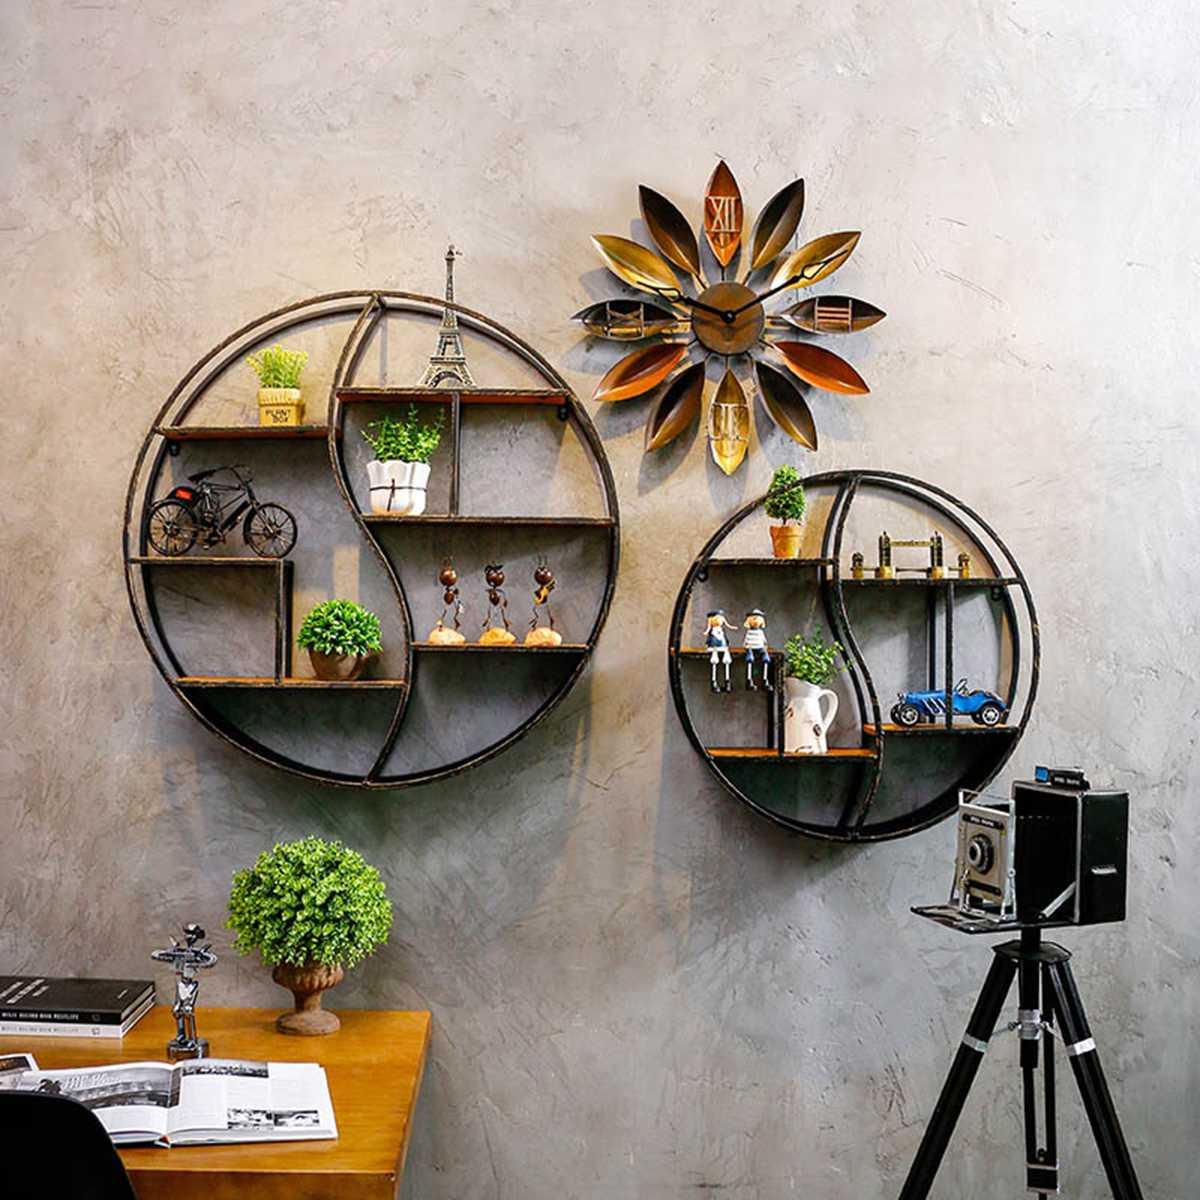 Round Wood Iron Books Vase Jewelry Display Shelf Hanging Stand Retro Style YIN YANG Pattern Wall-mounted Storage Rack Organiser